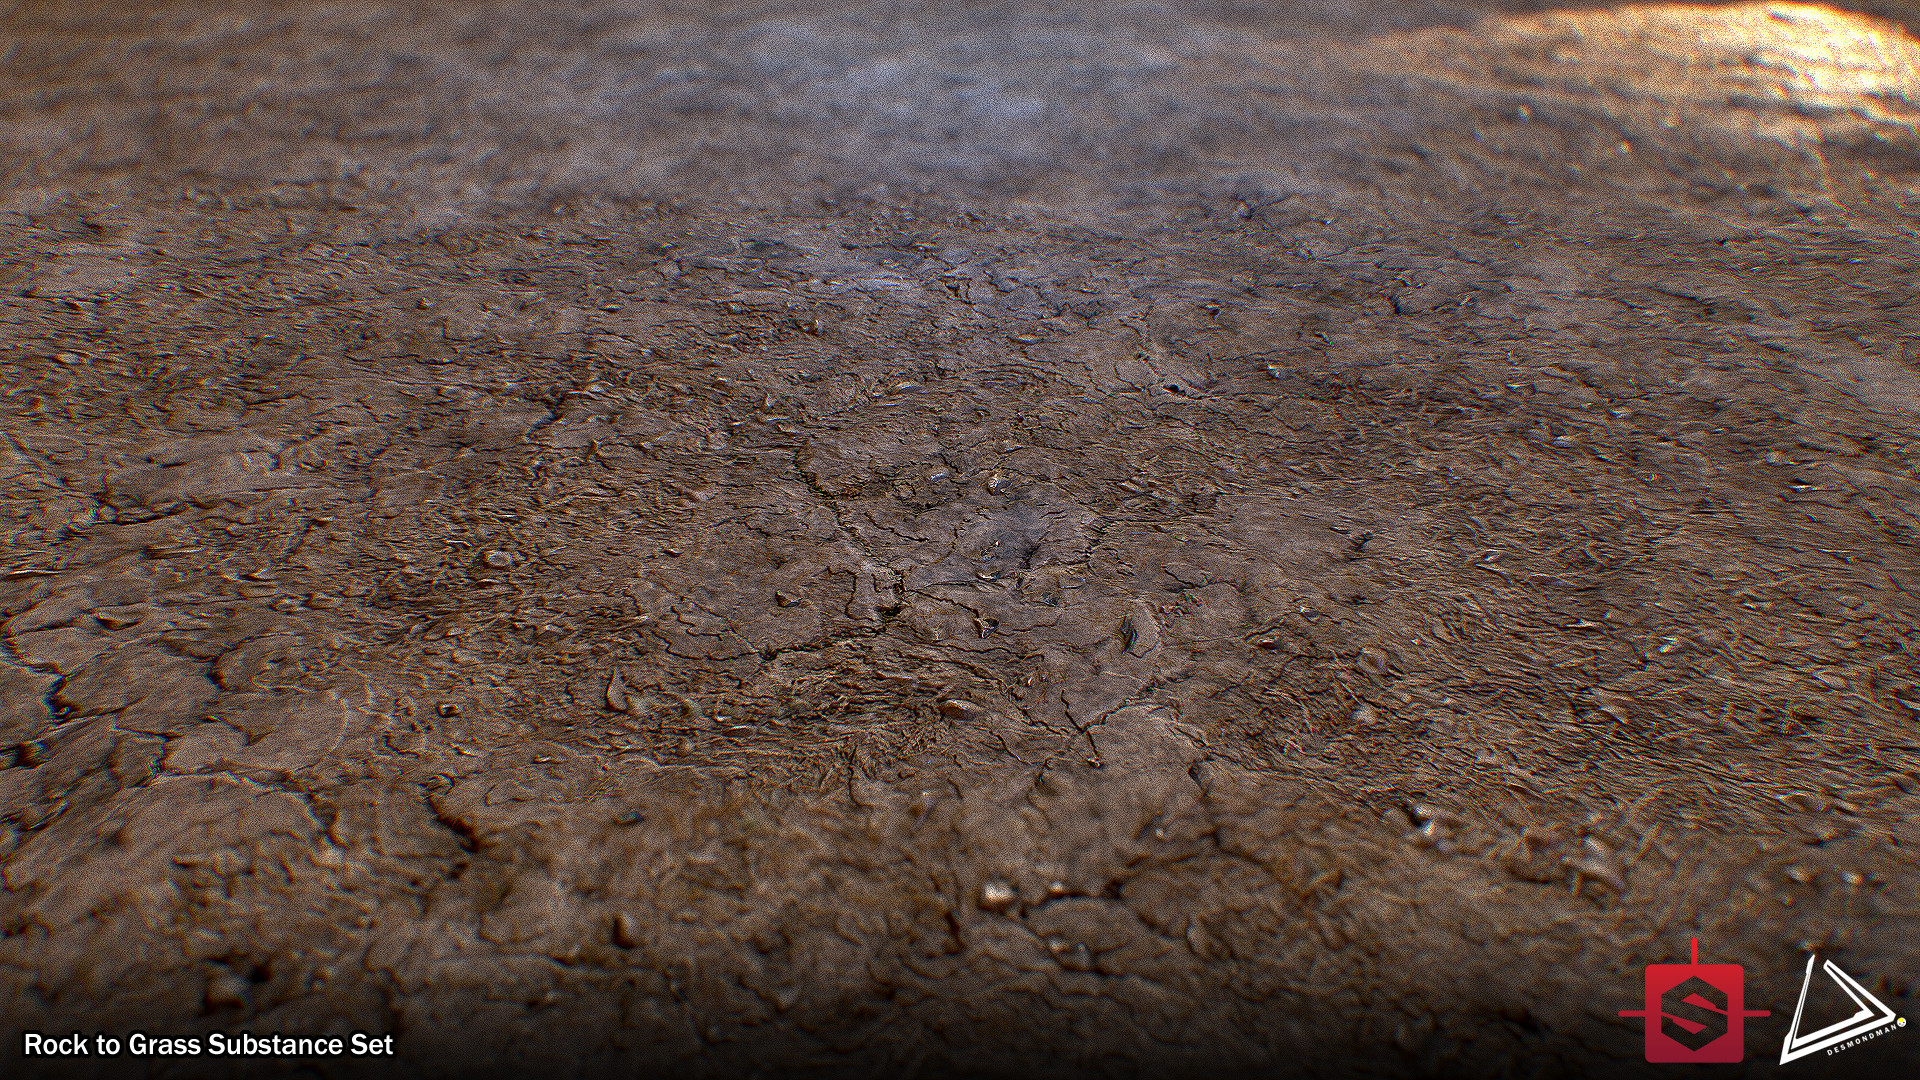 Desmond man rockygrass set terrain renders 02